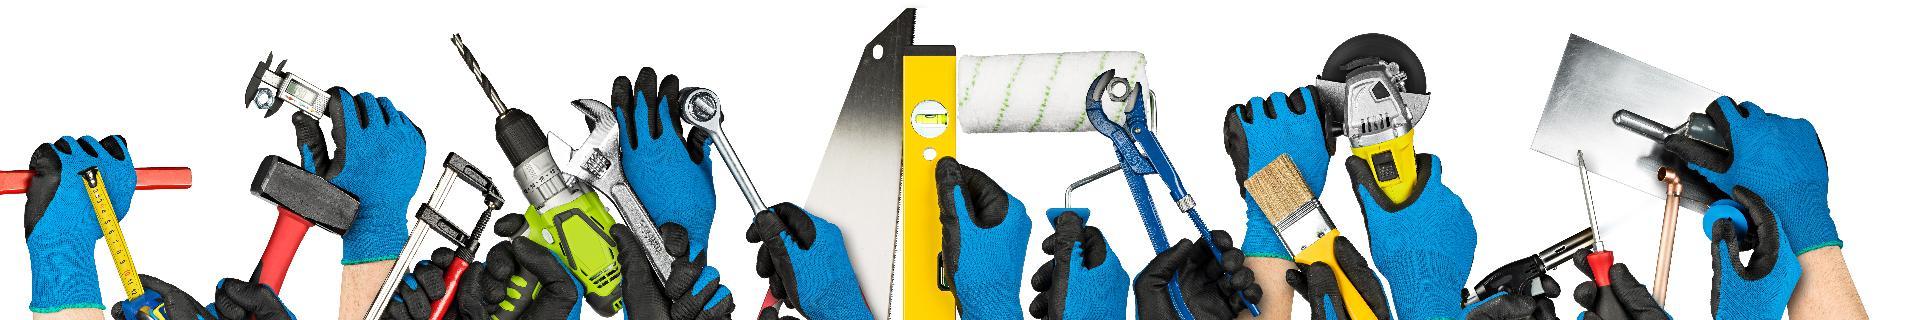 Hand and Power Tool Safety (OSHA)